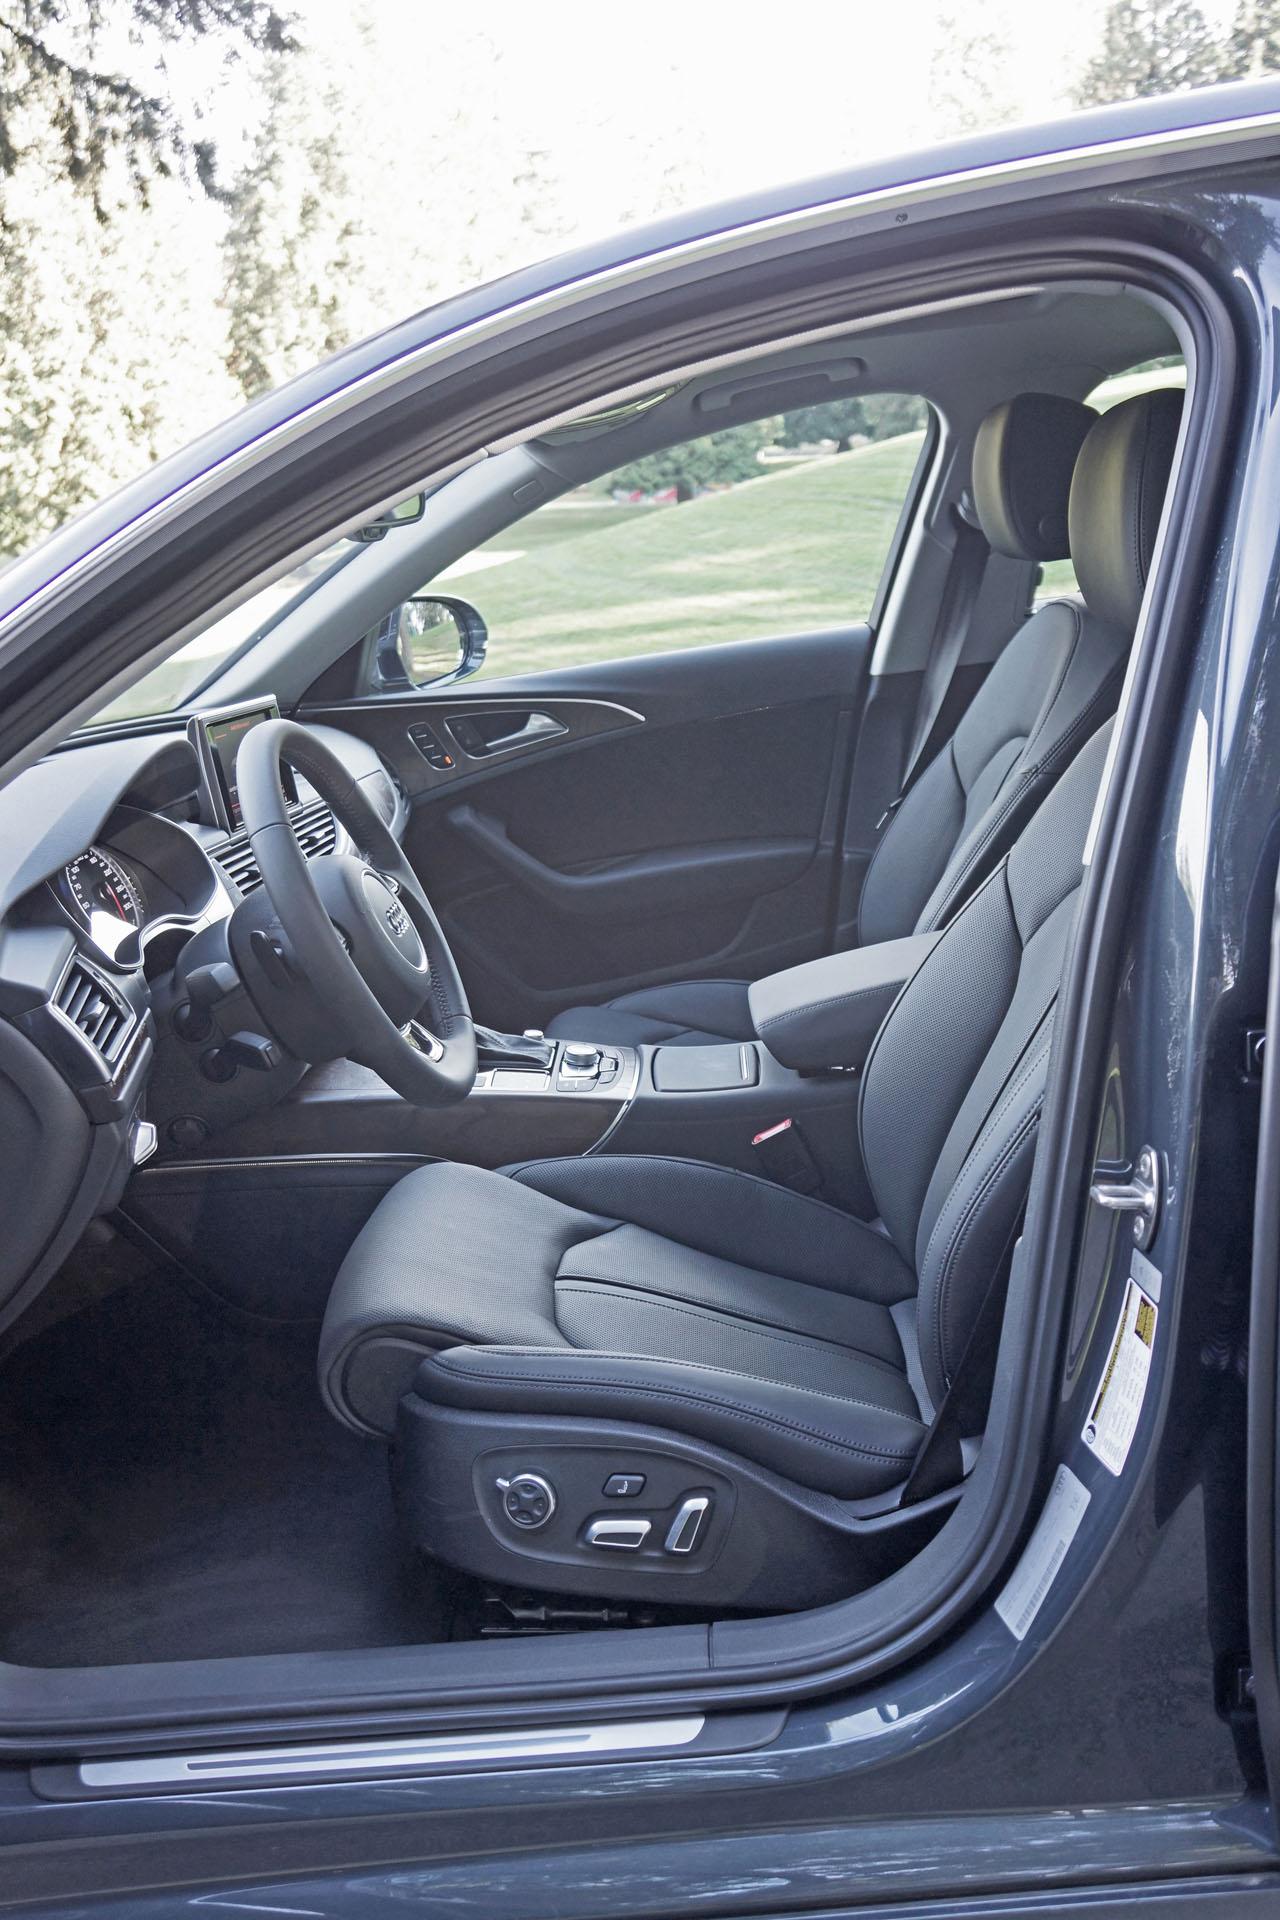 2016 Audi A6 3 0t Interior: 2016 Audi A6 3.0 TFSI Quattro Technik Road Test Review